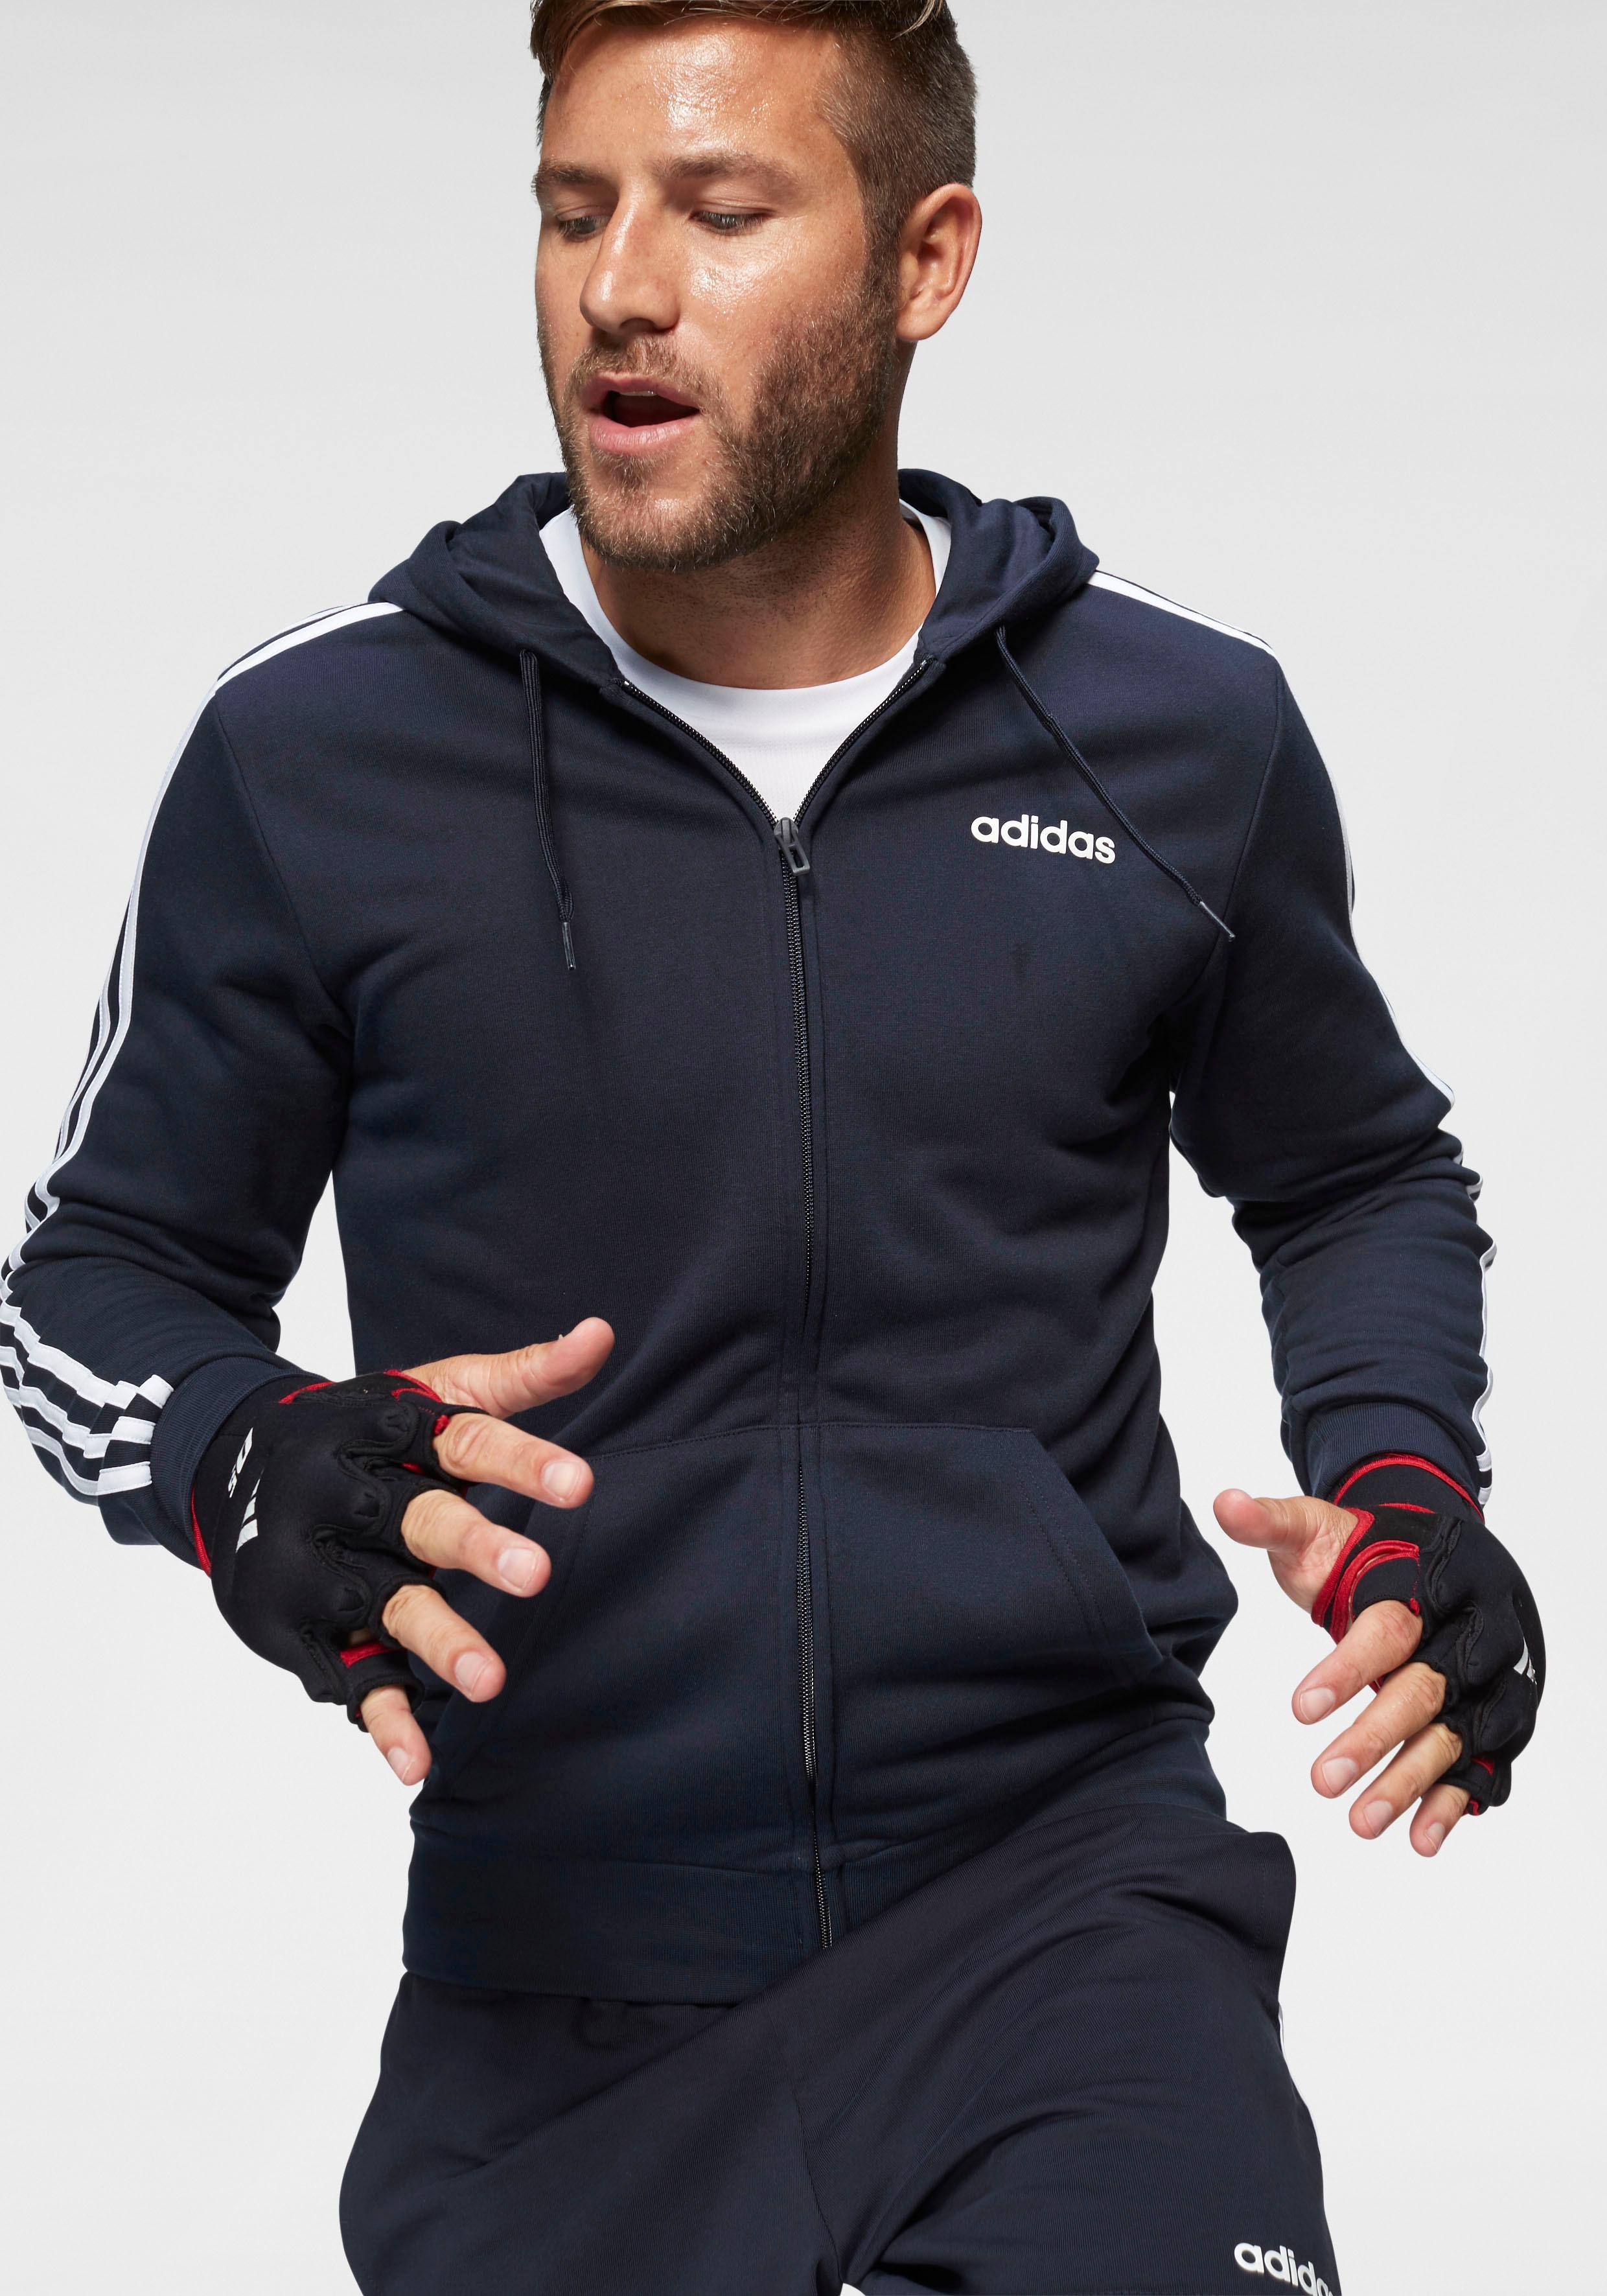 adidas Kapuzensweatjacke ESSENTIALS 3 STRIPES FULL ZIP FRENCH TERRY | Bekleidung > Sweatshirts & -jacken | Blau | Adidas